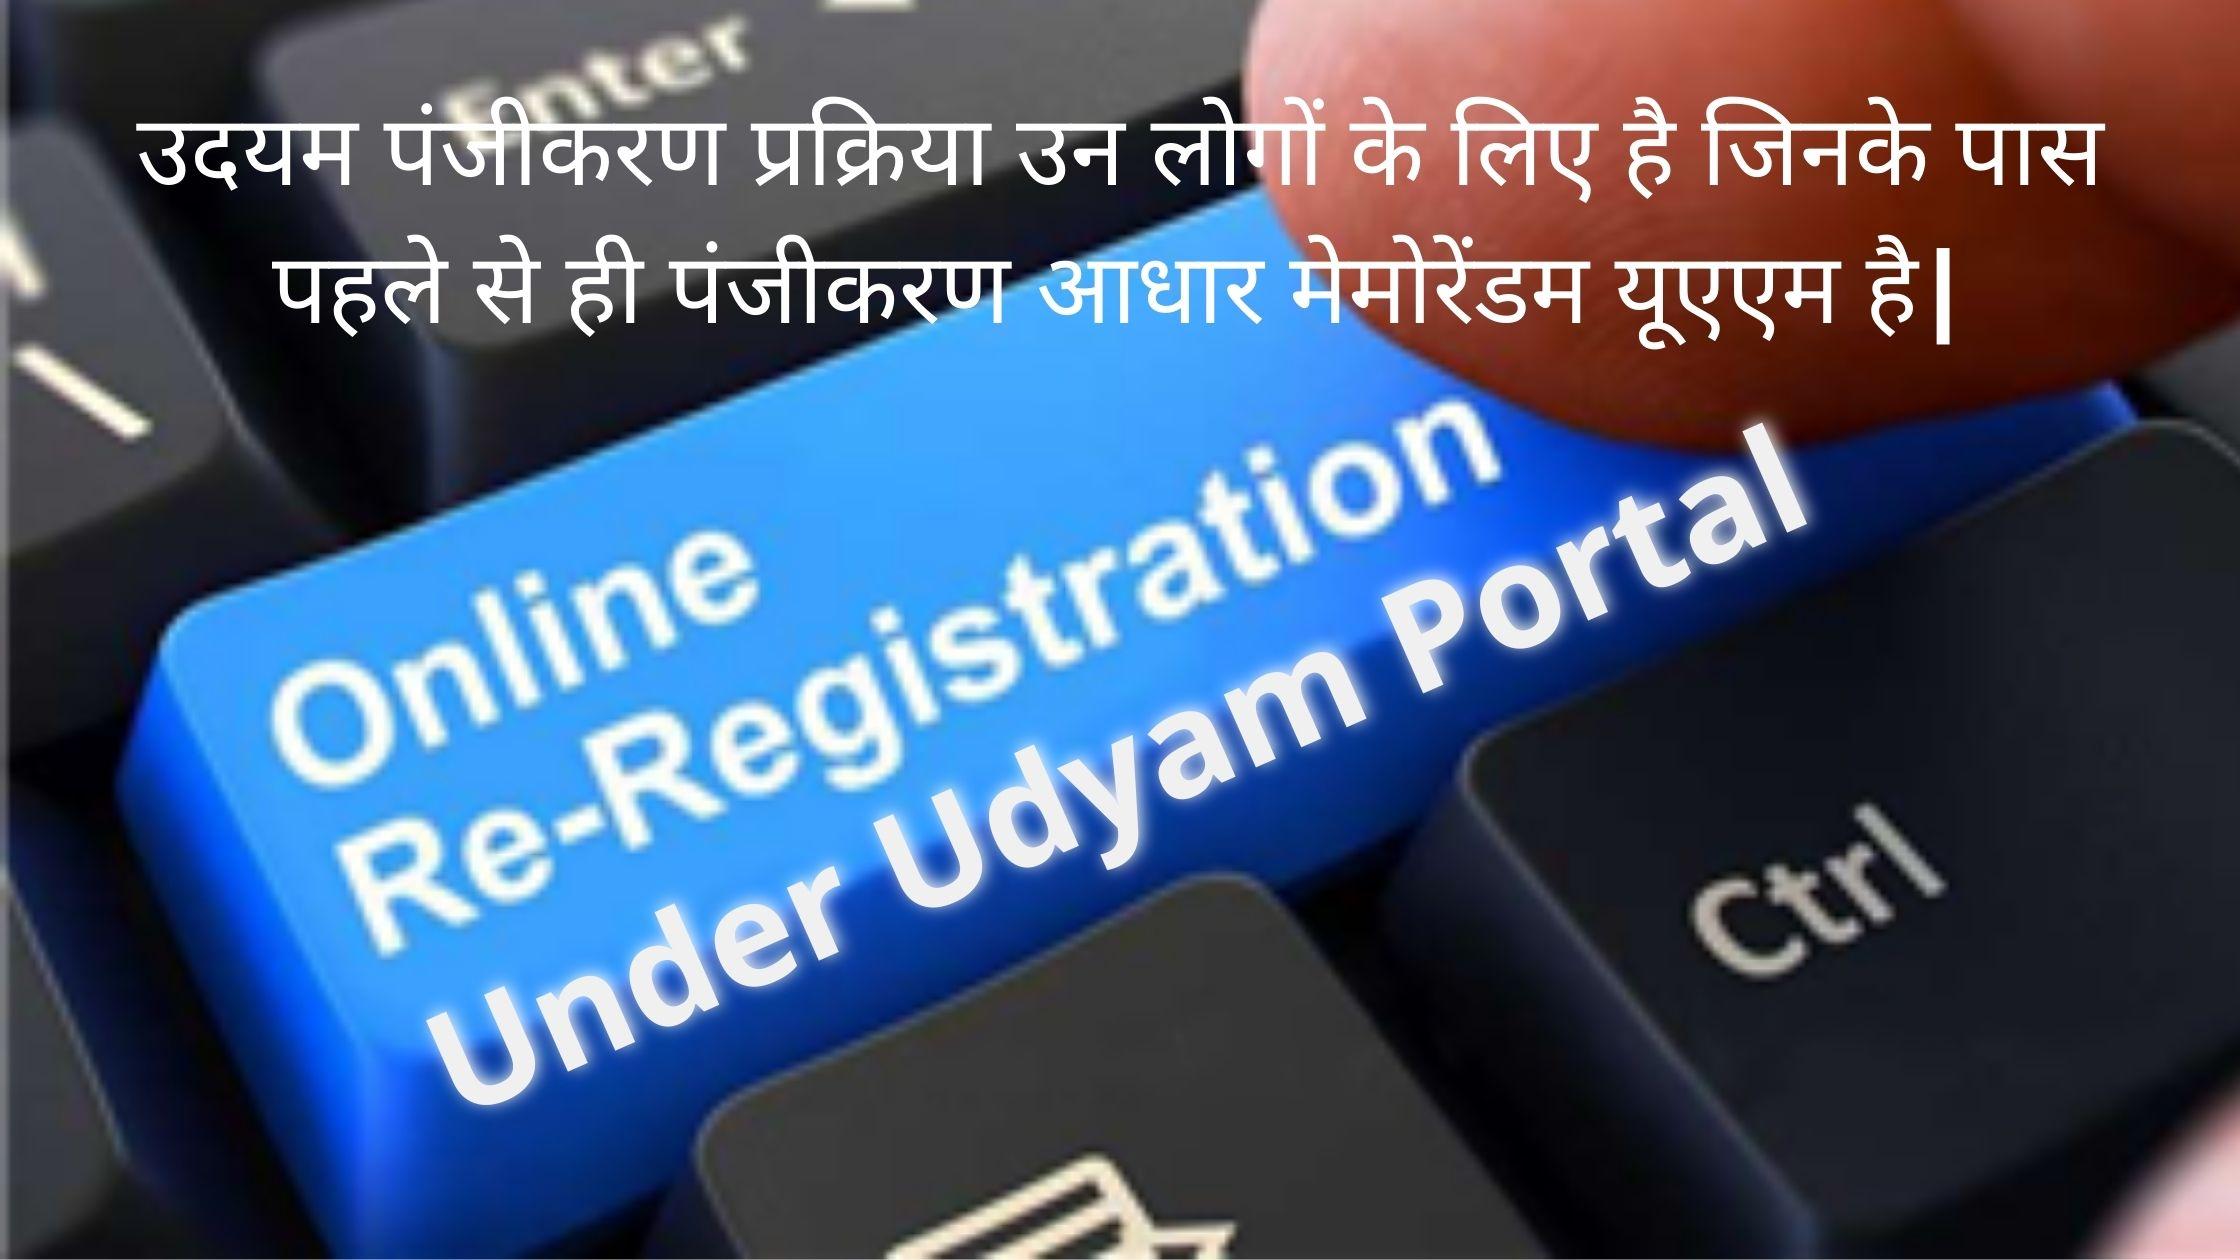 Udyam Registration Procedure for those who already having registration as Udyog Aadhaar Memorandum UAM in hindi